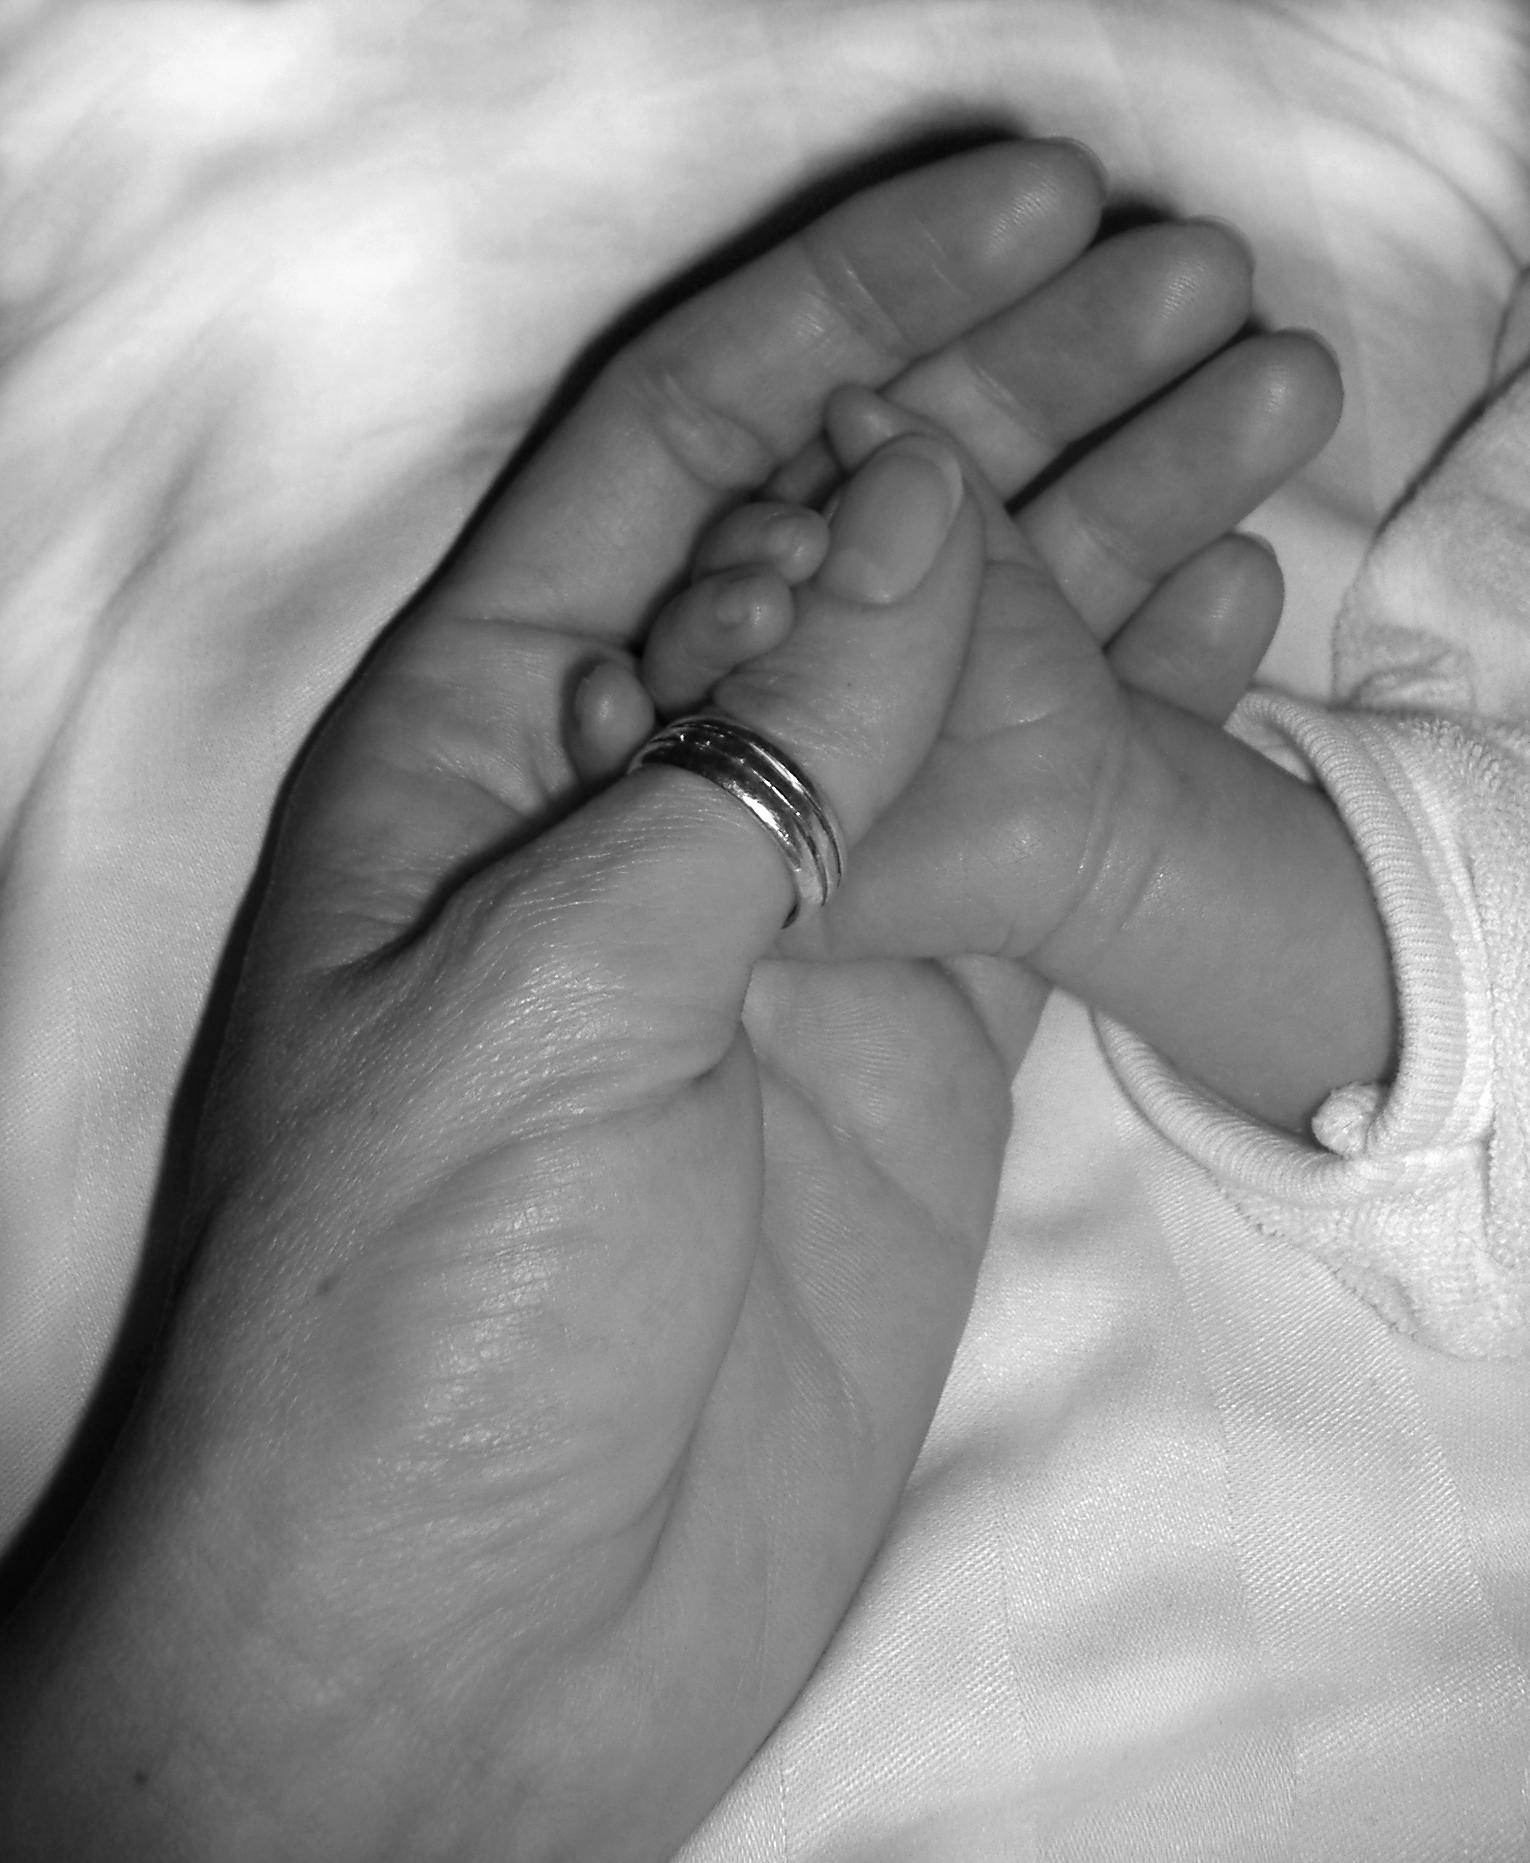 joint-hands-1313489.jpg